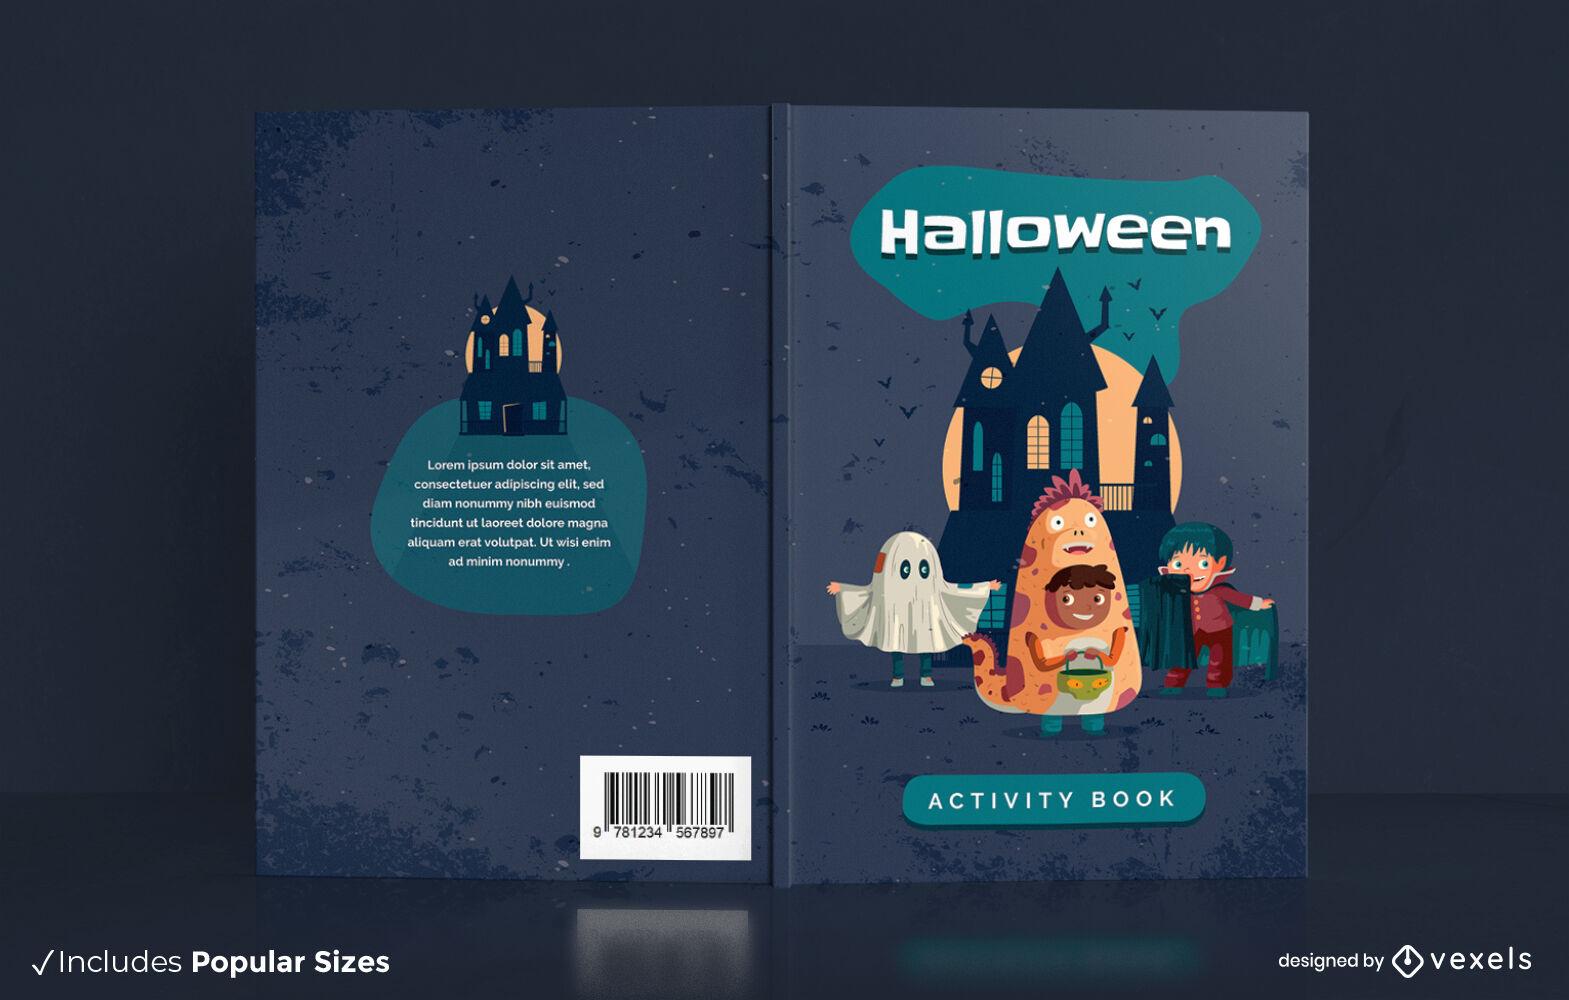 Kinderhalloween-Aktivitätsbuch-Cover-Design